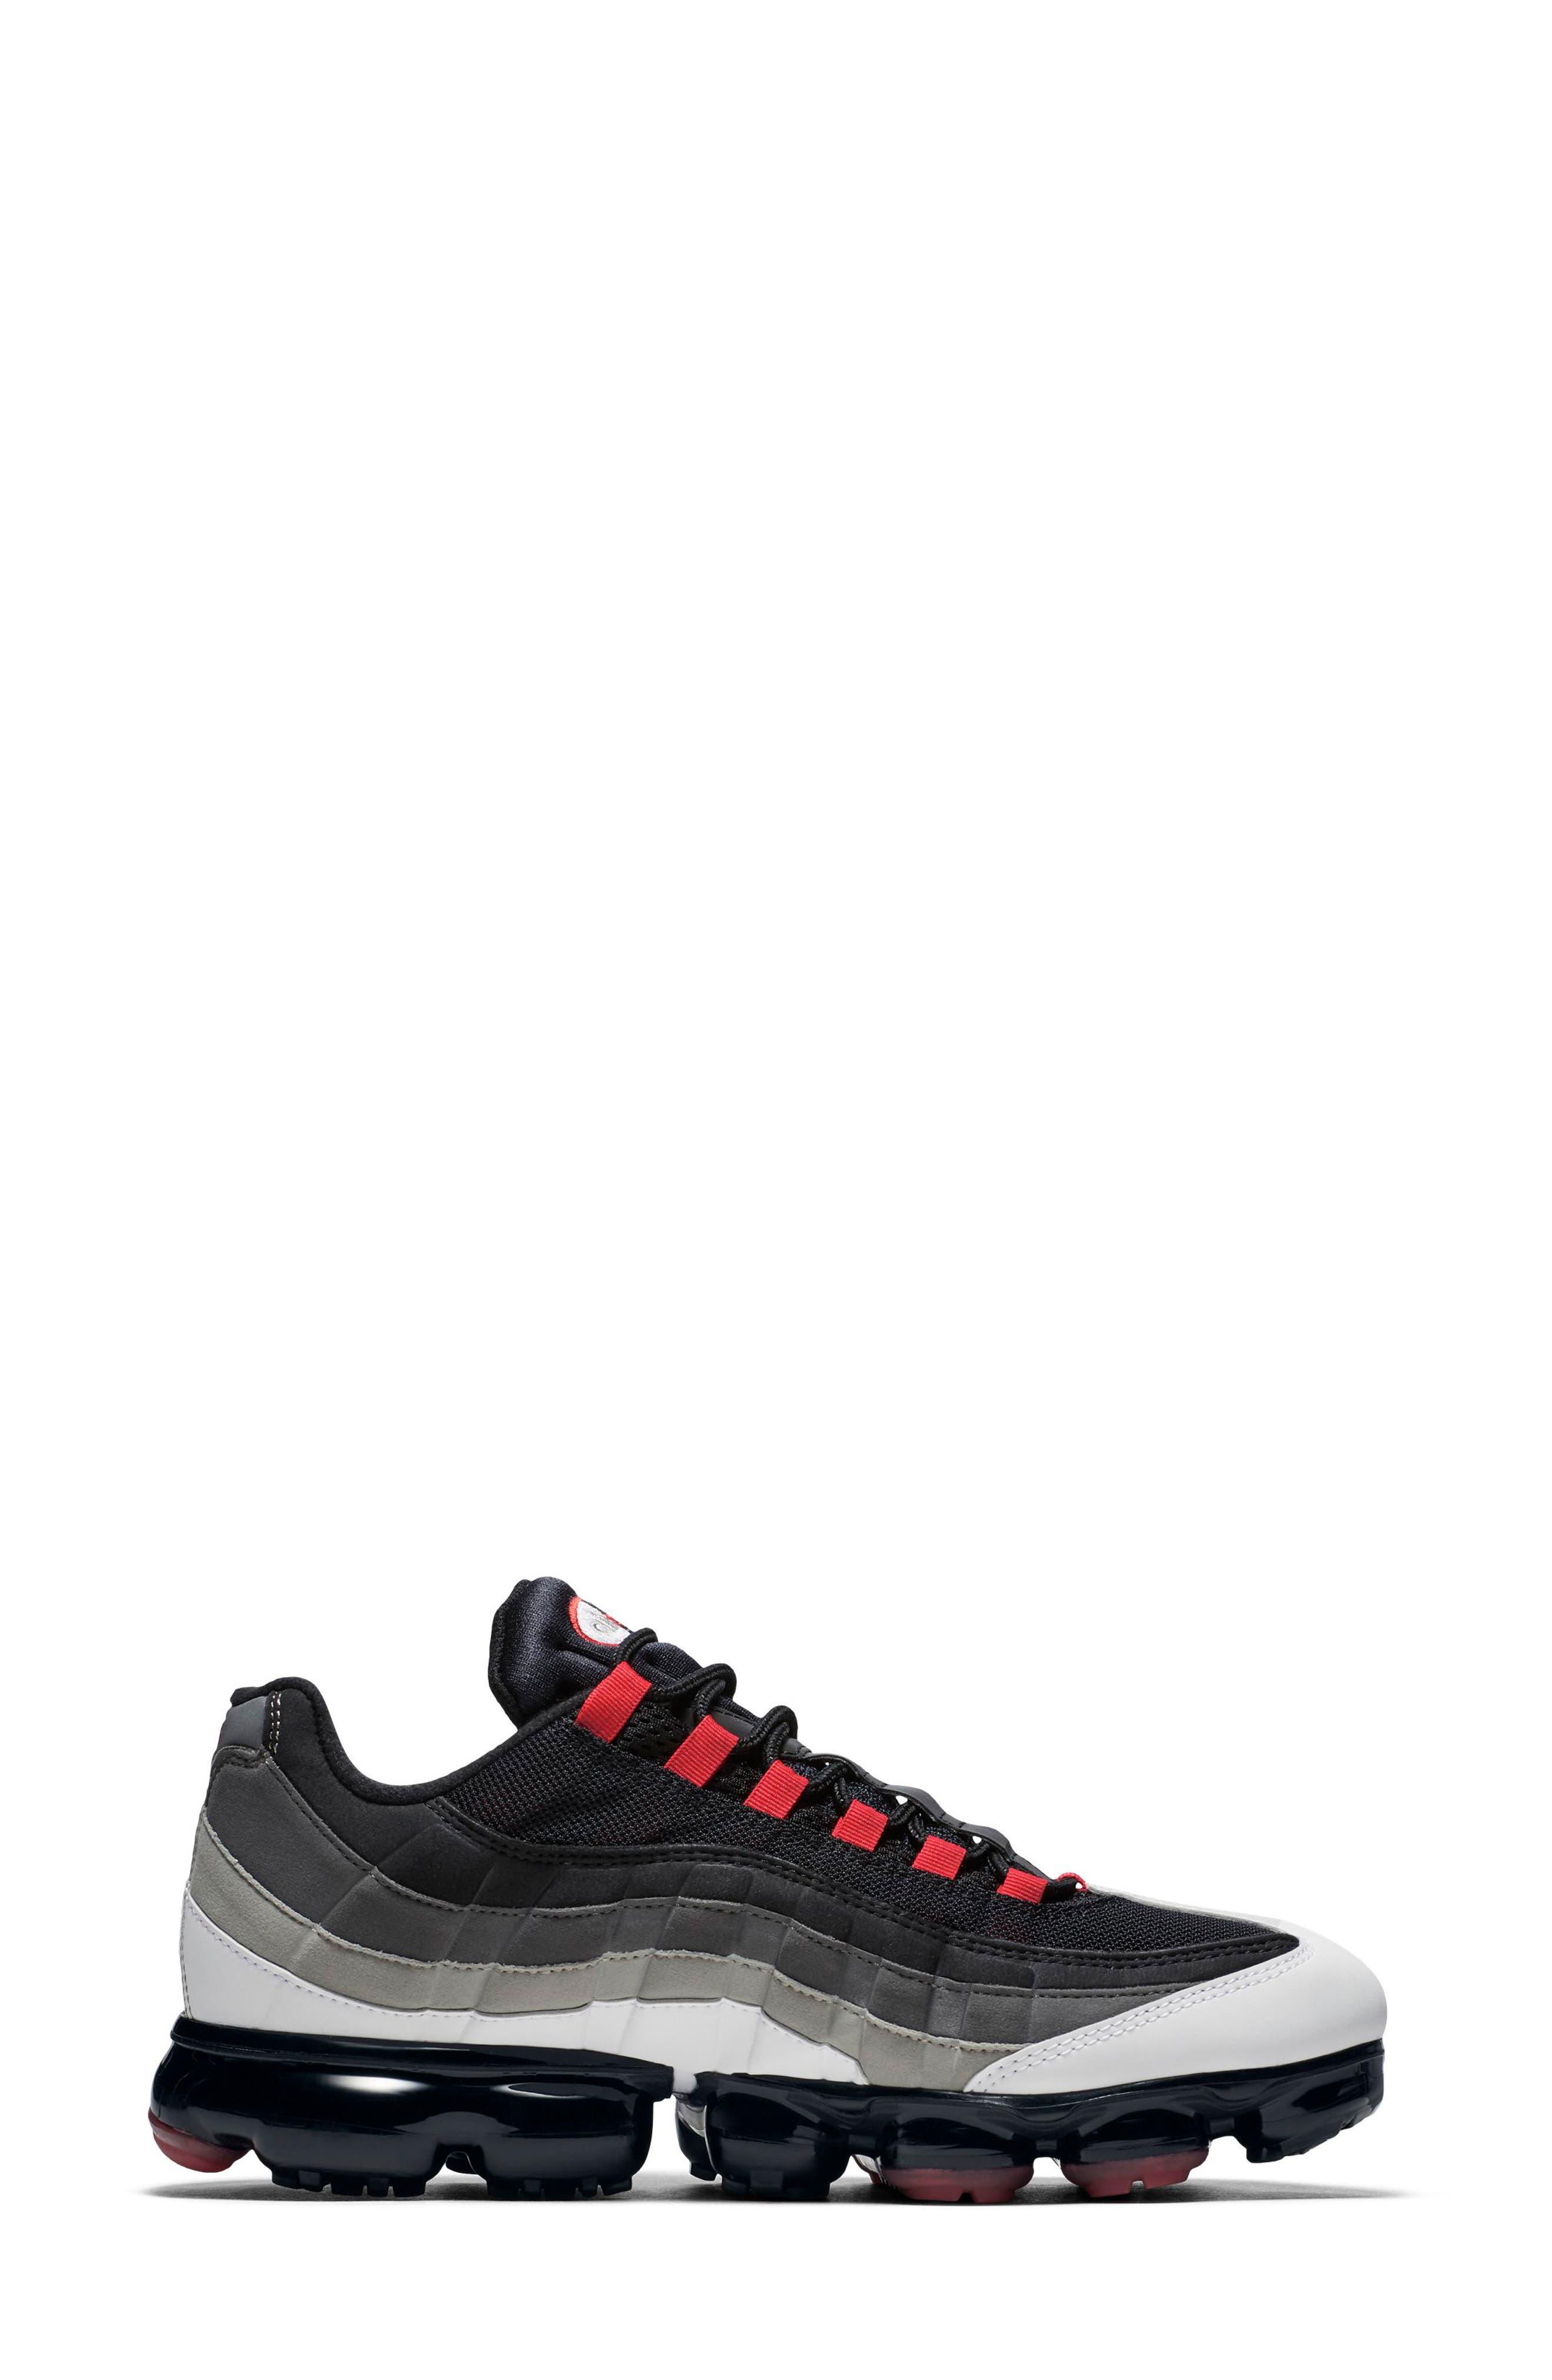 Air VaporMax '95 Sneaker,                             Alternate thumbnail 3, color,                             WHITE/ RED/ PEWTER/ GRANITE